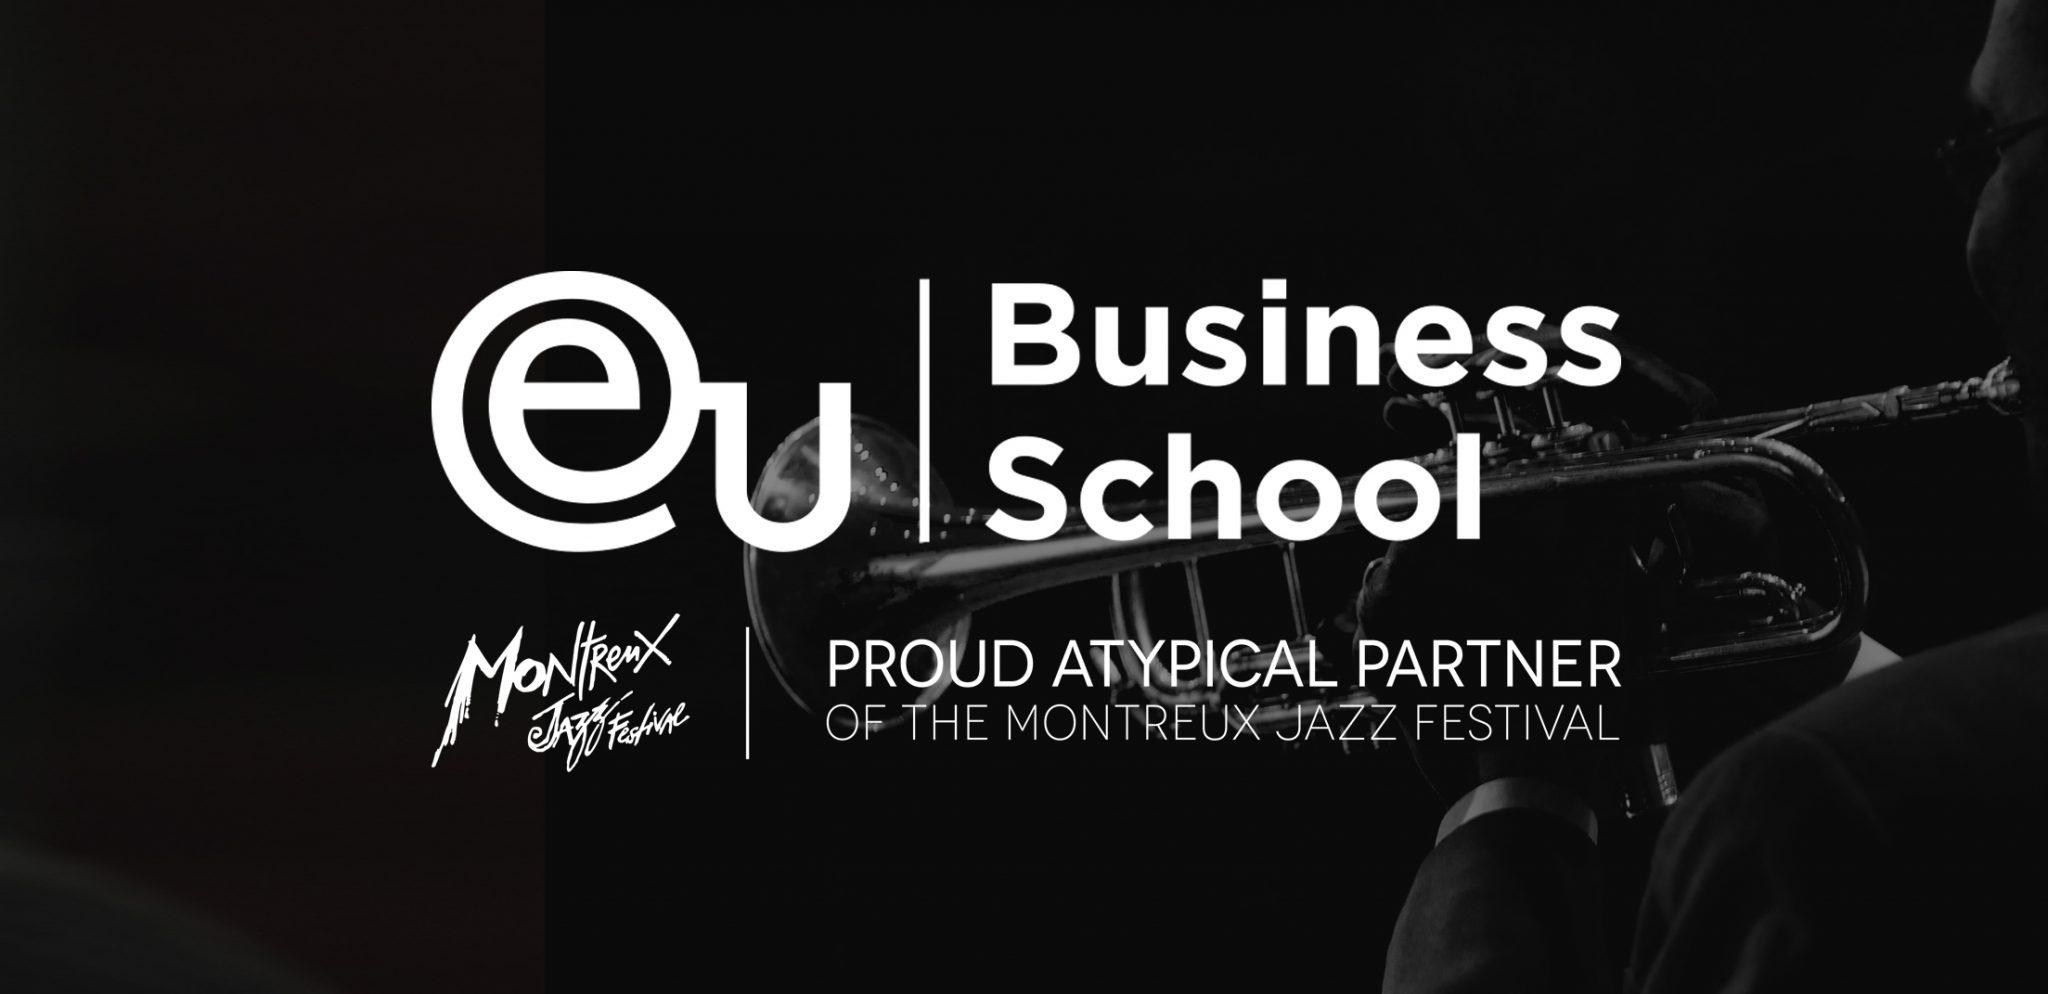 EU's Partnership at Montreux Jazz Festival 2015